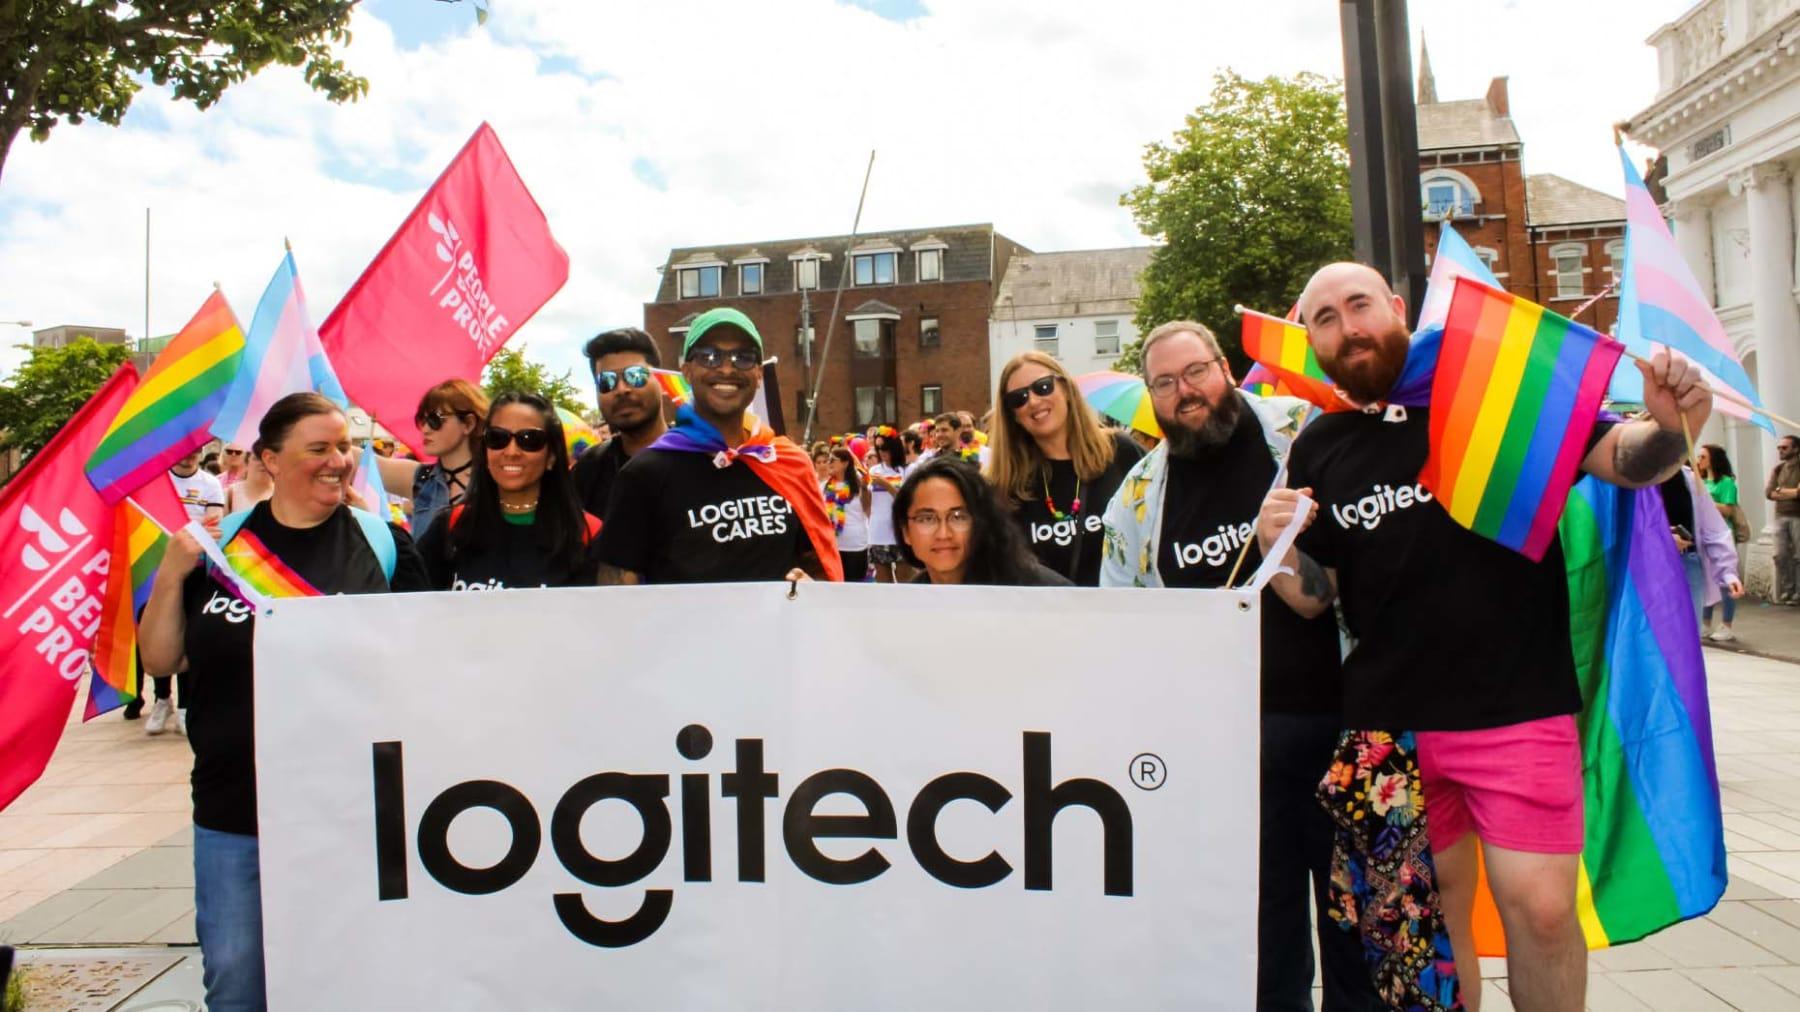 Logitech-gruppfoto med Pride-tema